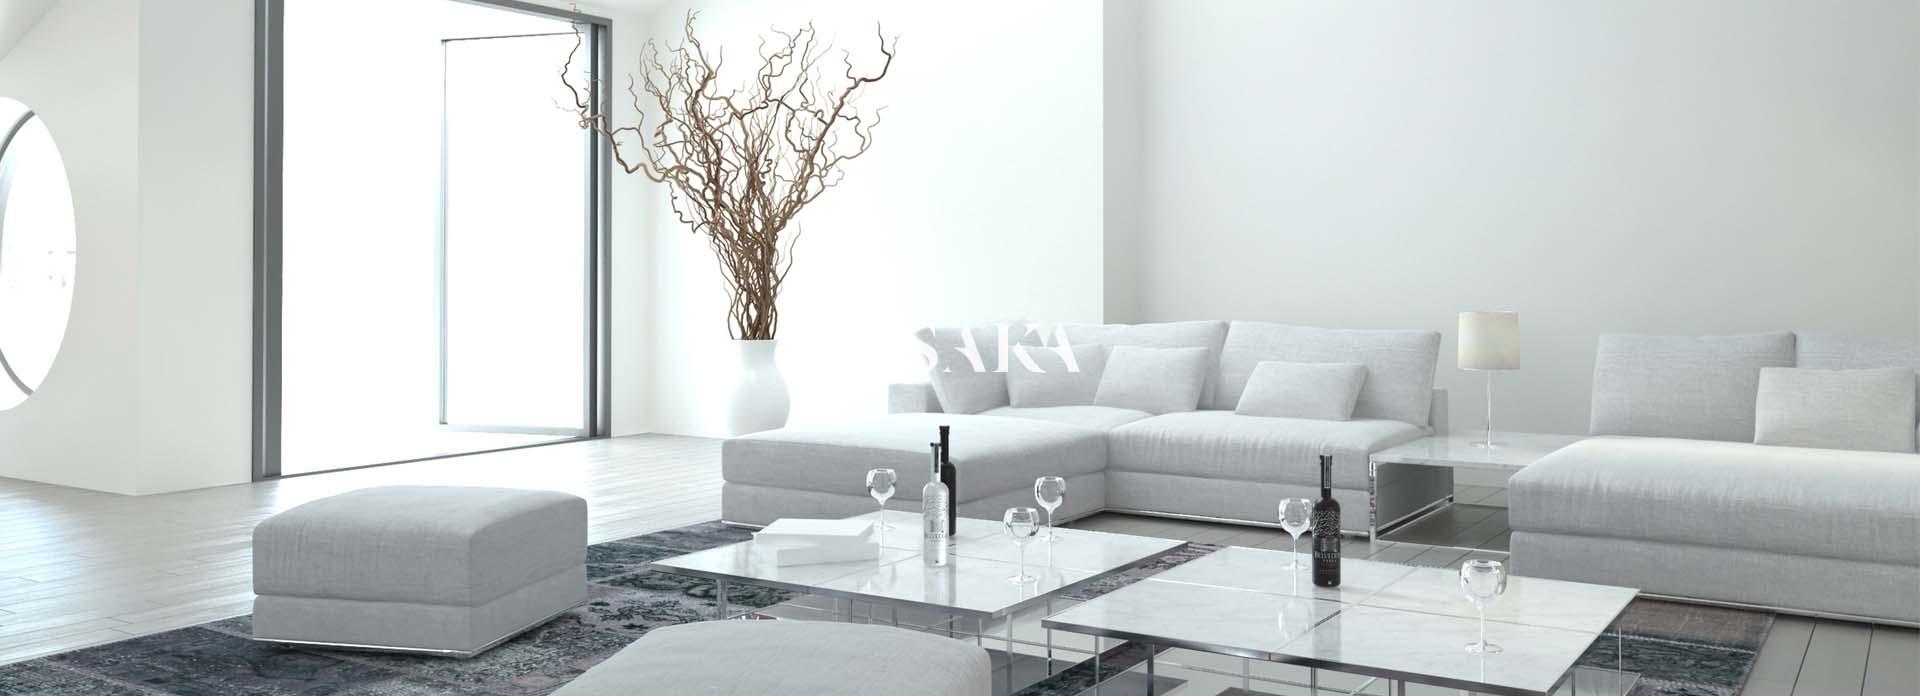 pintura-decorativa-Sublime